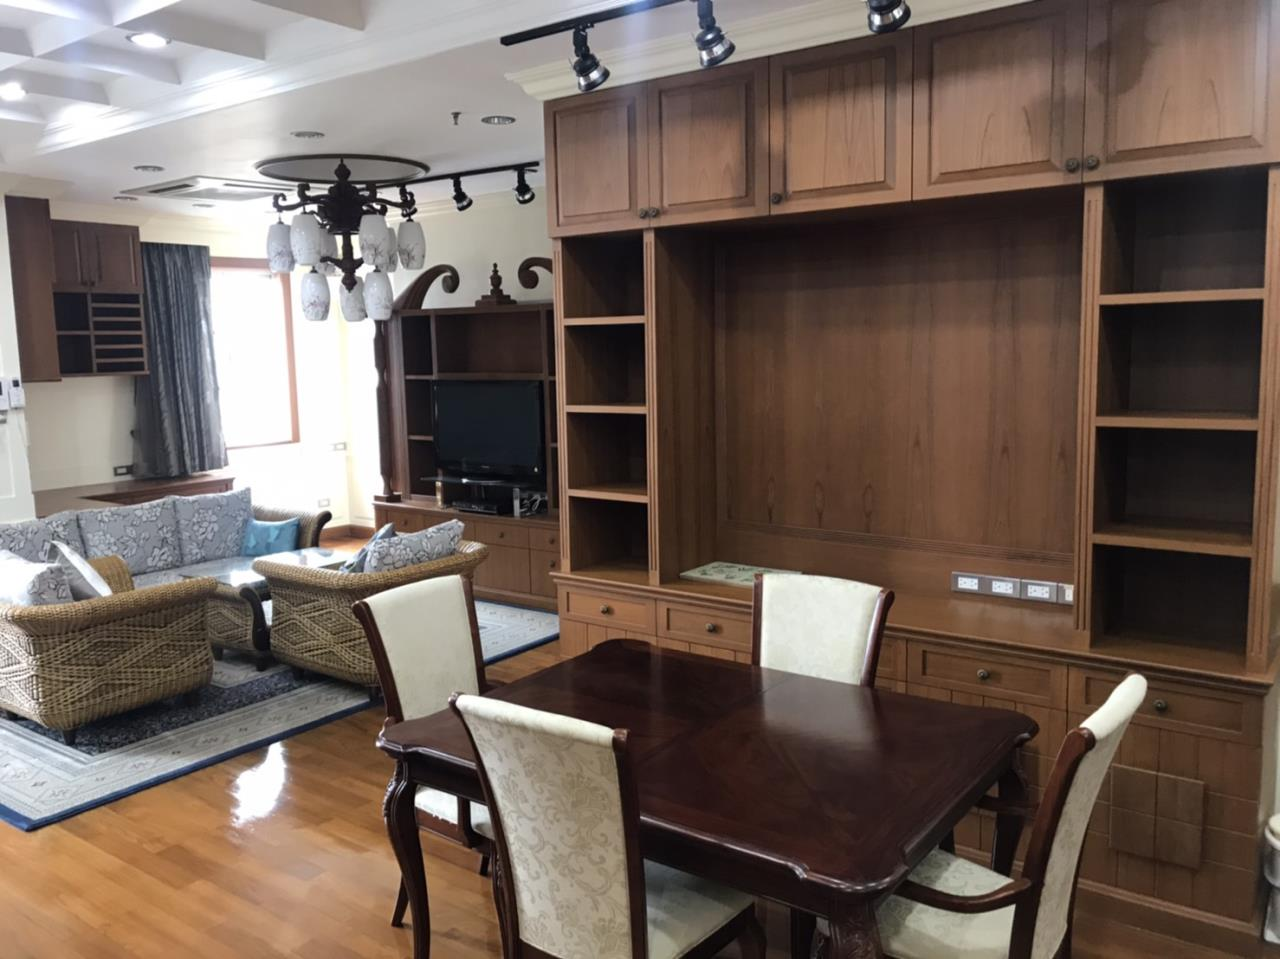 Blueocean property Agency's Condo For Rent – Condo Citismart Sukhumvit 18 5